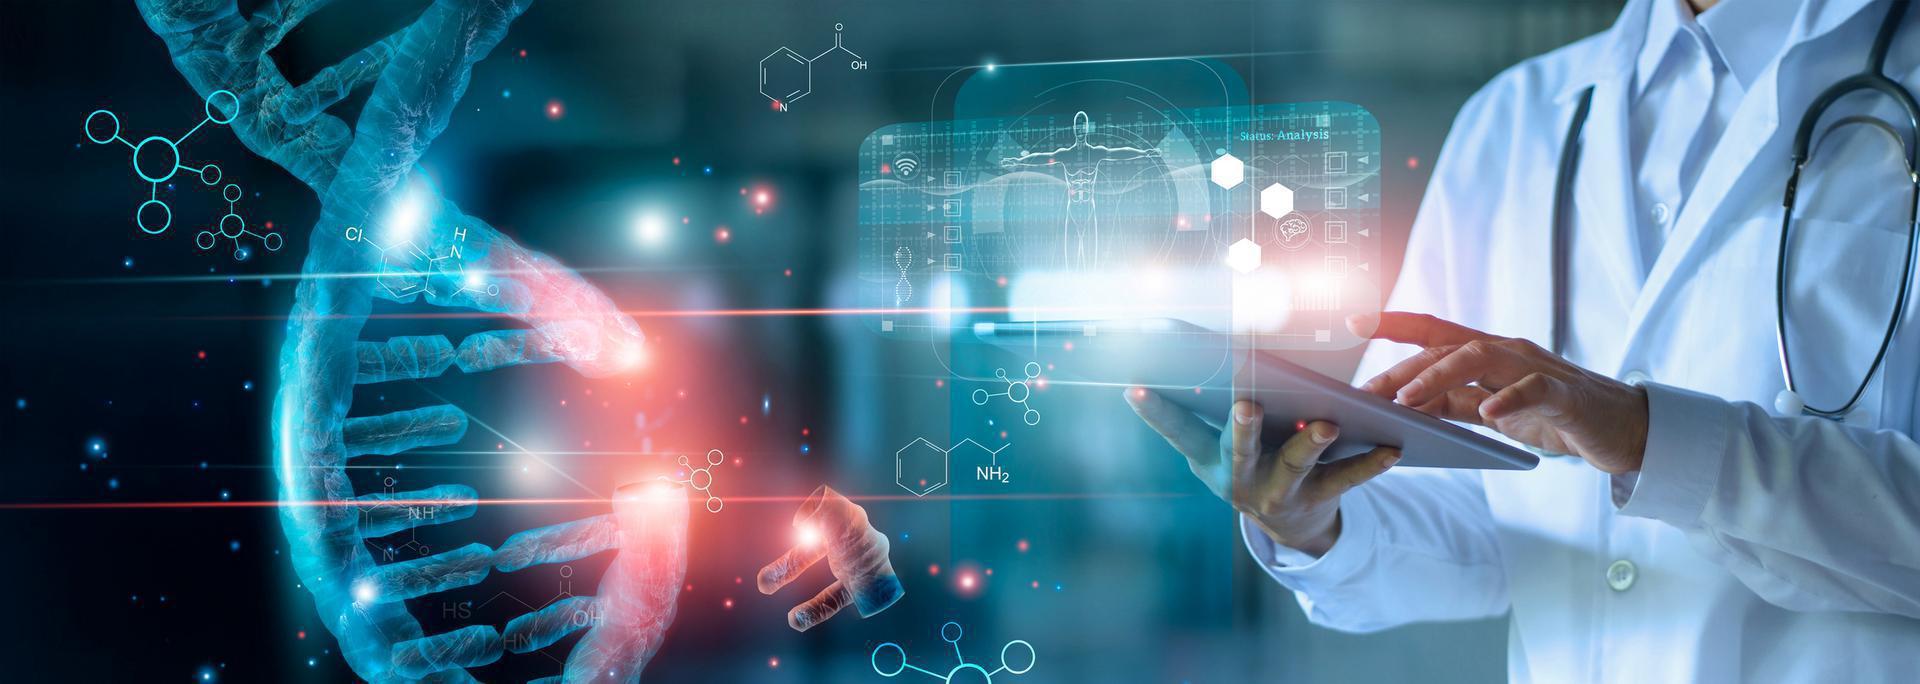 Drug Testing and DNA Testing - Bay Minette AL - featured